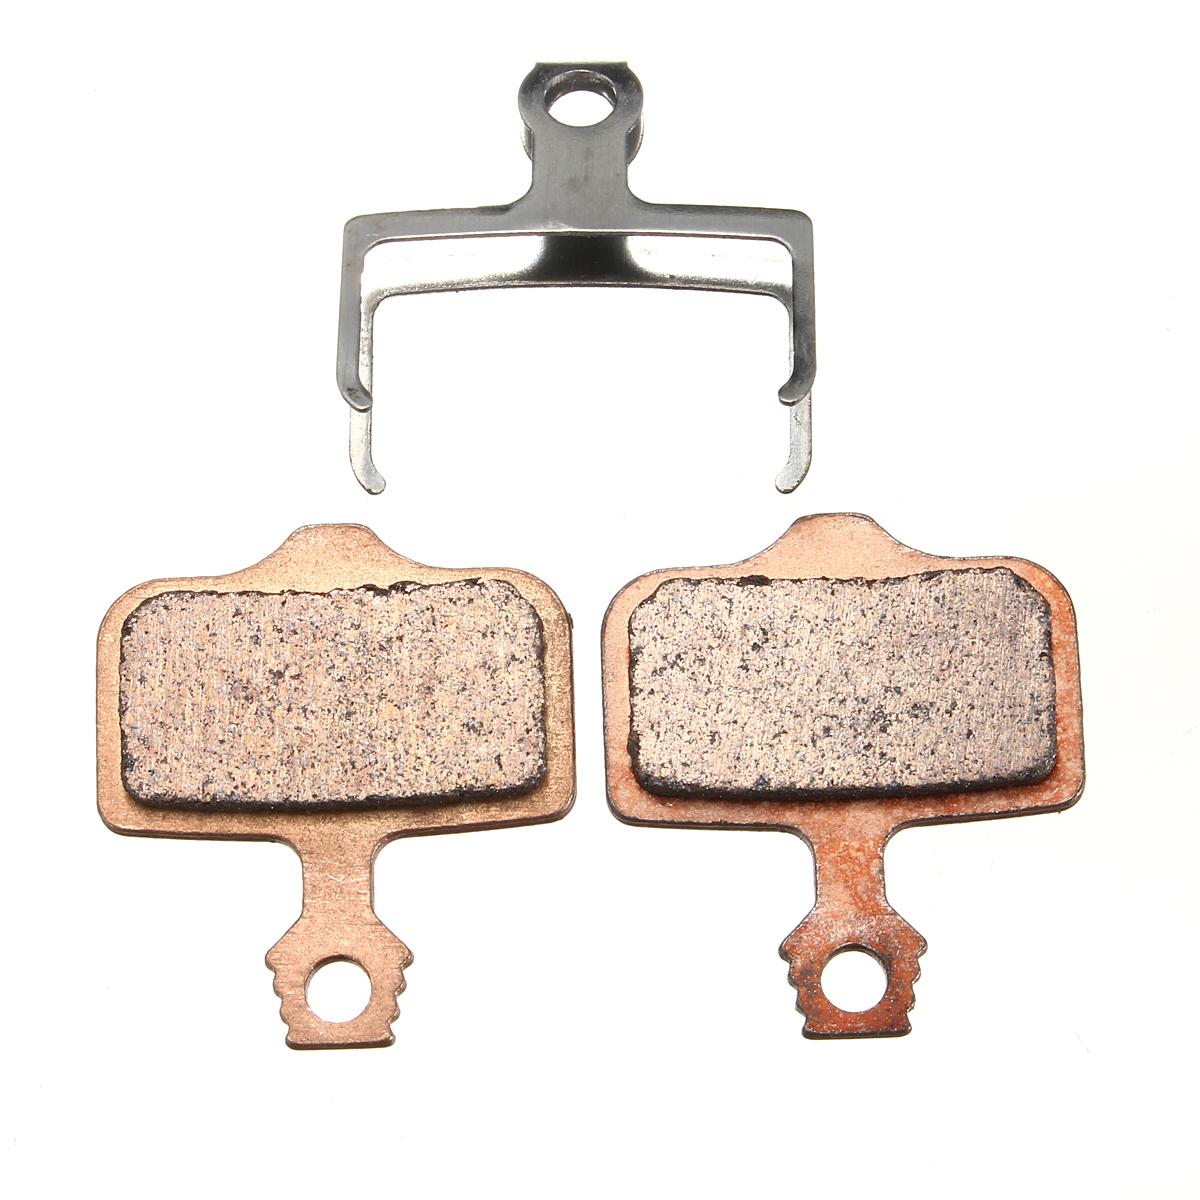 1 Pair Bike Bicycle Disc Brake Pads For Avid Elixir E1 3 5